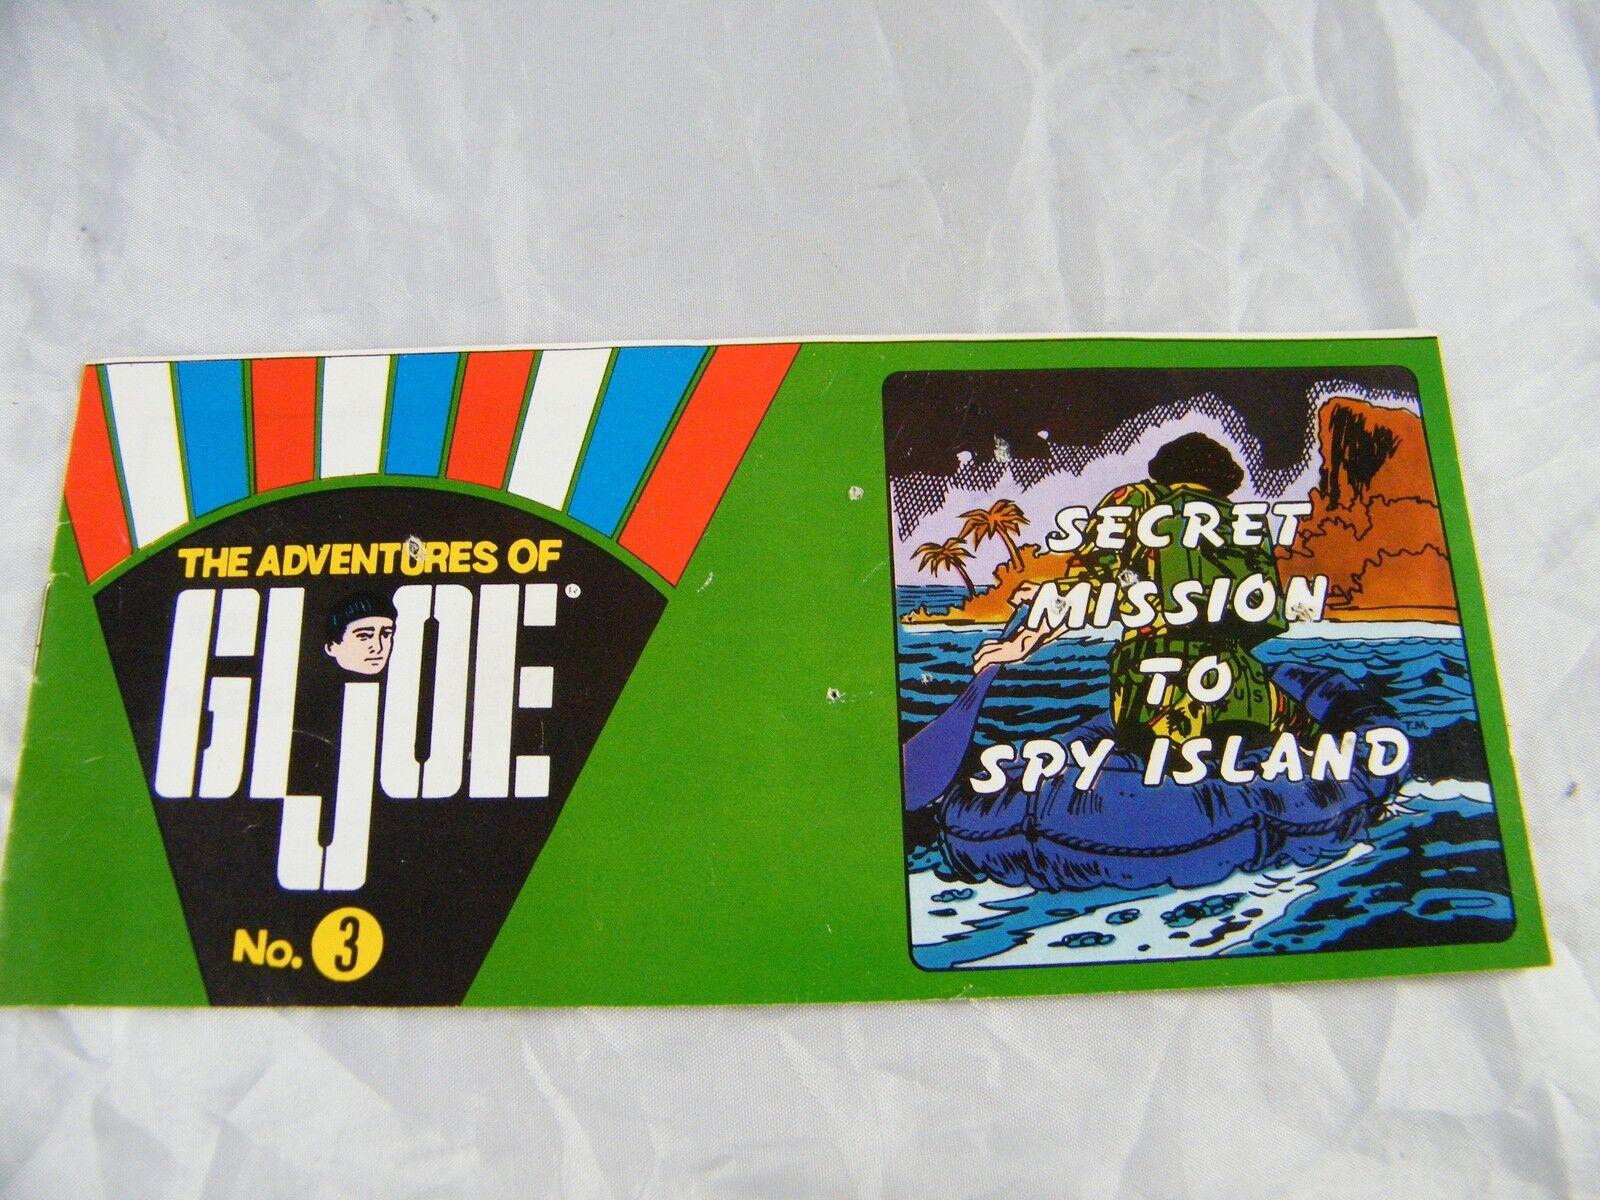 1969 G.I. JOE MINI-COMIC SECRET MISSION TO SPY ISLAND PUBLISHED HASBRO